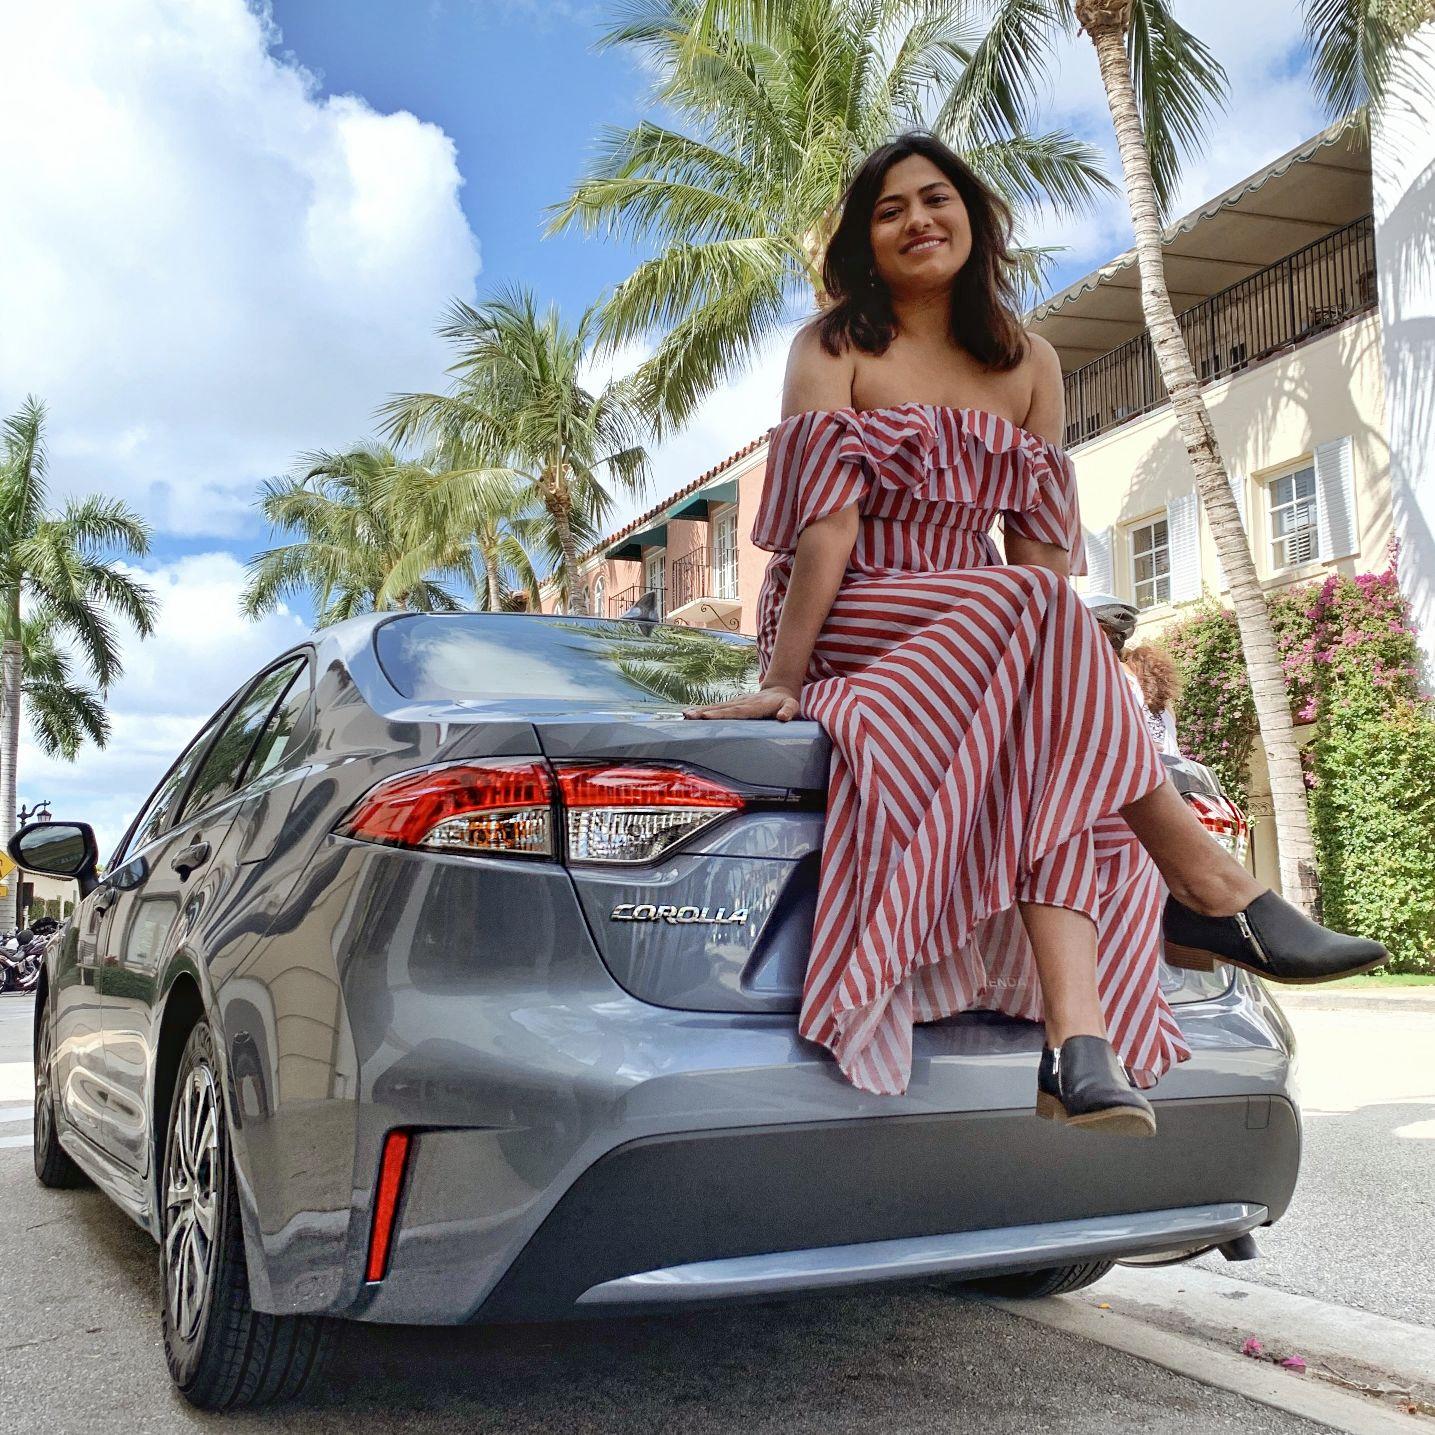 Miami Car Blogger Afroza Khan Reviews 2020 Toyota Corolla Hyrbid